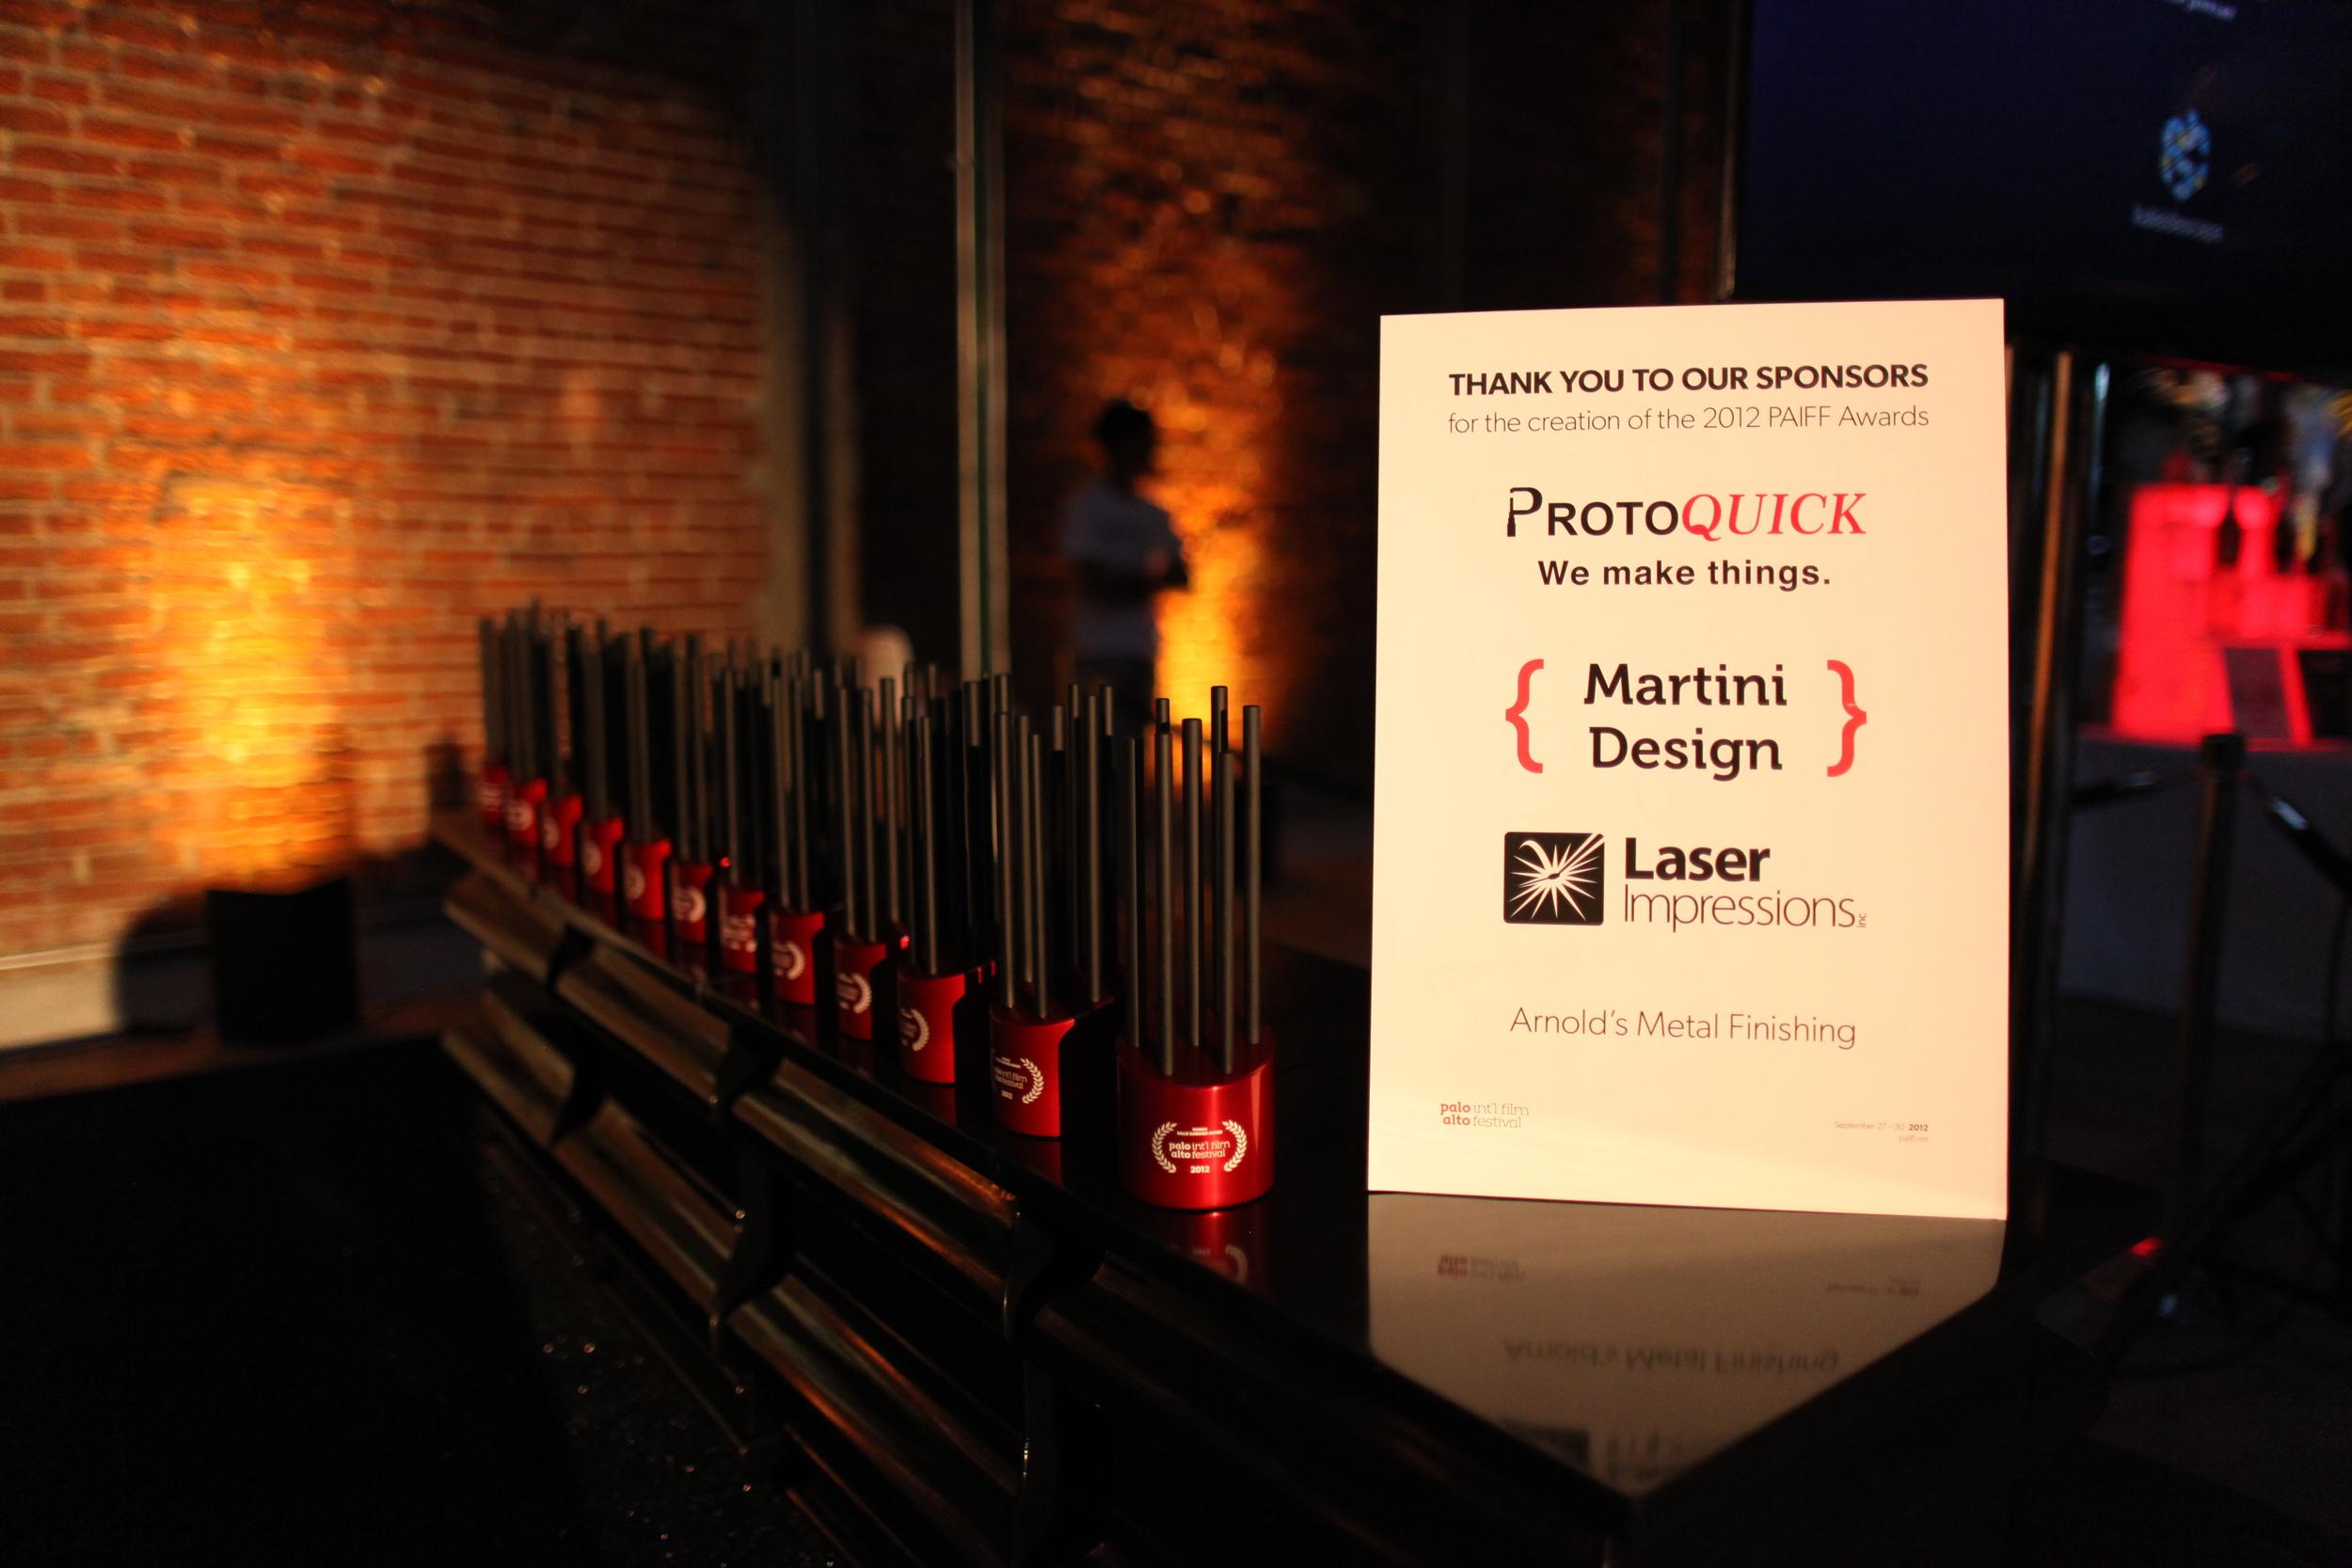 7_Awards_Lined_Up.JPG